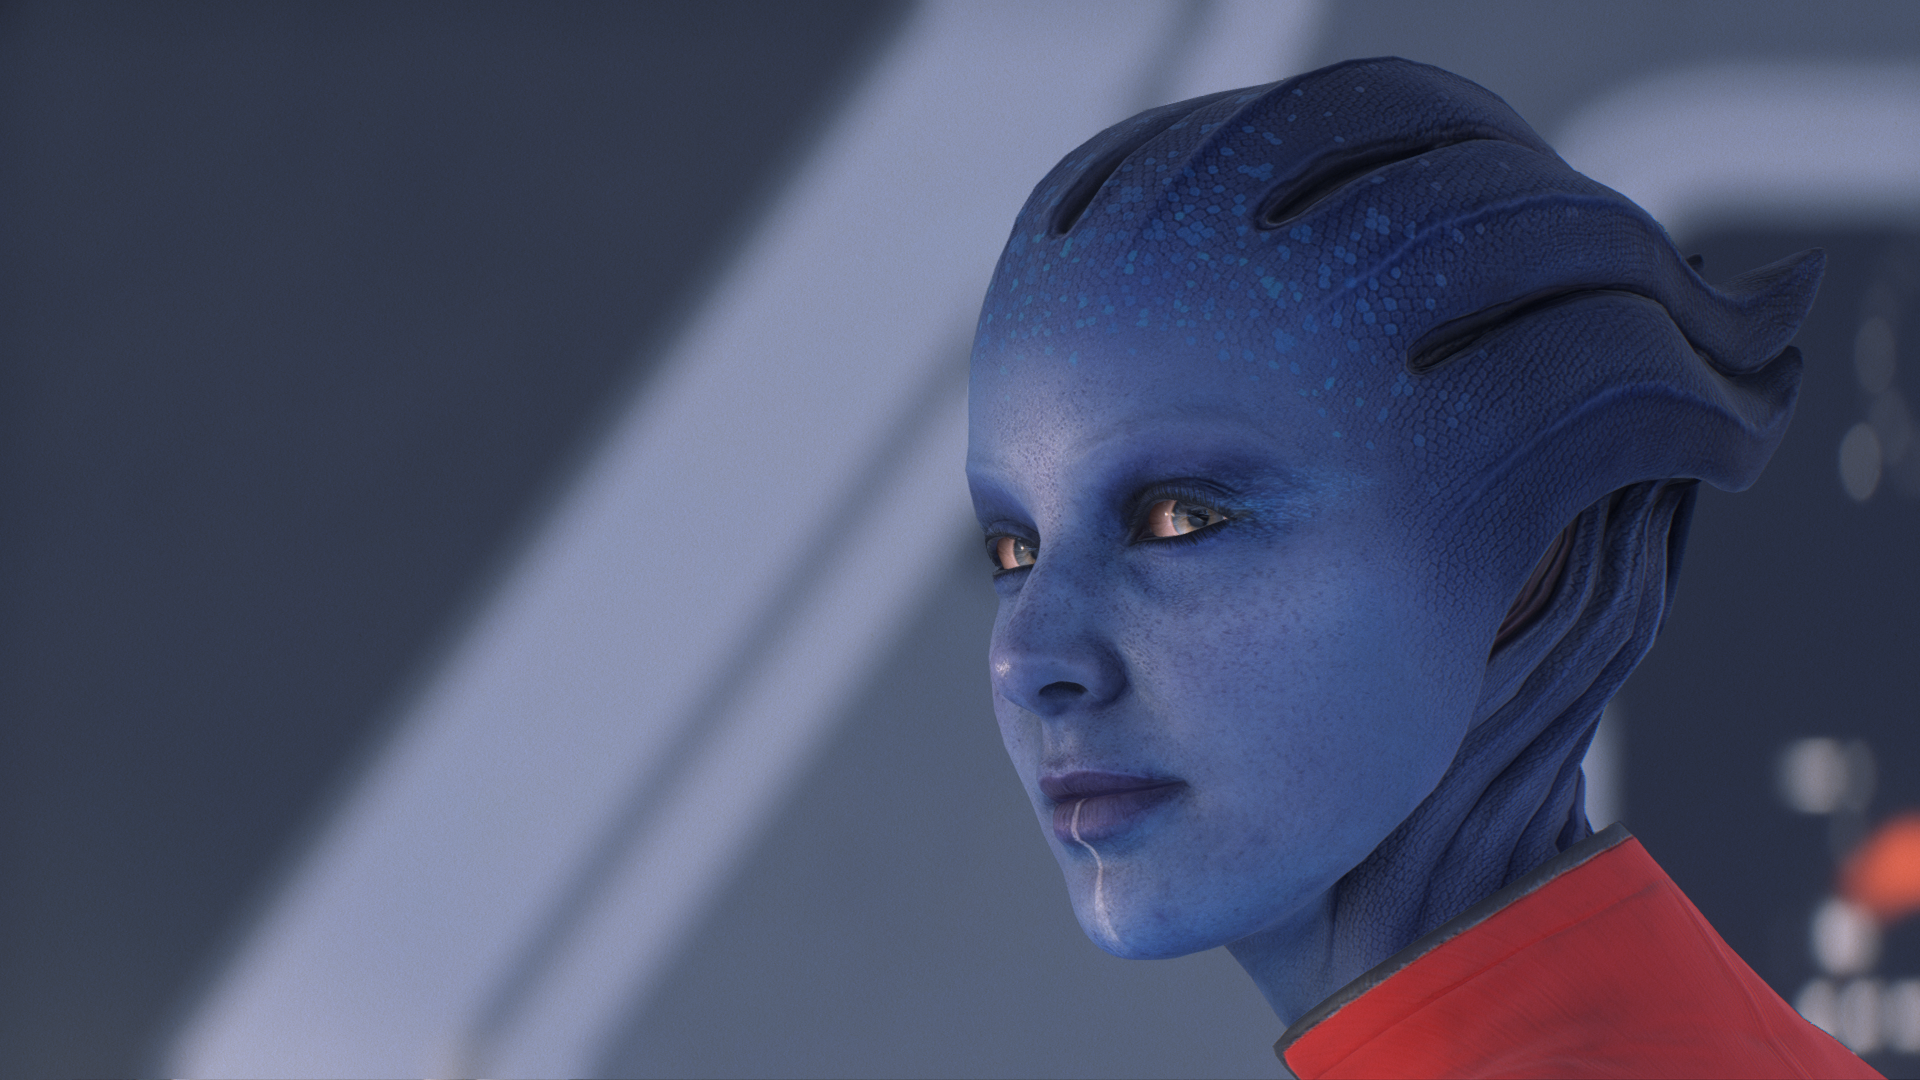 Mass Effect Andromeda_Cinetools_0003_JTC.png